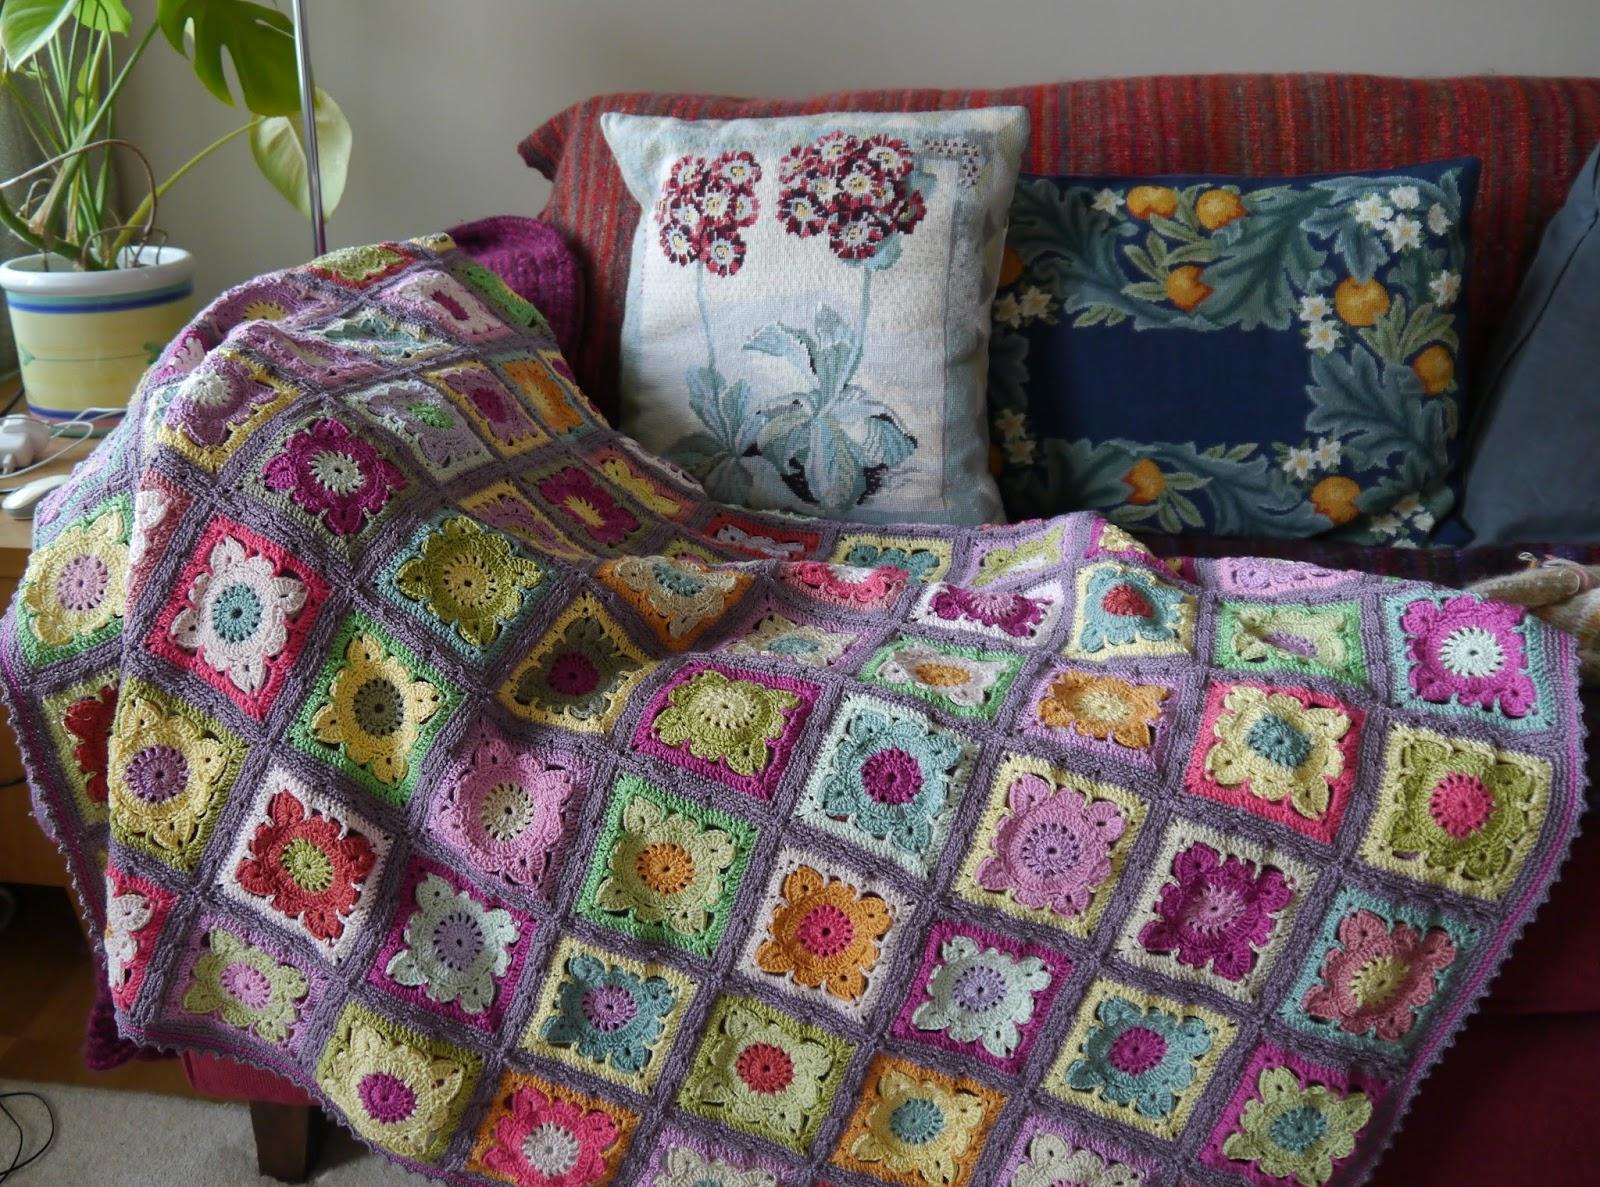 Knitting Yarn Bdo : Elsaxenia willow crochet blanket